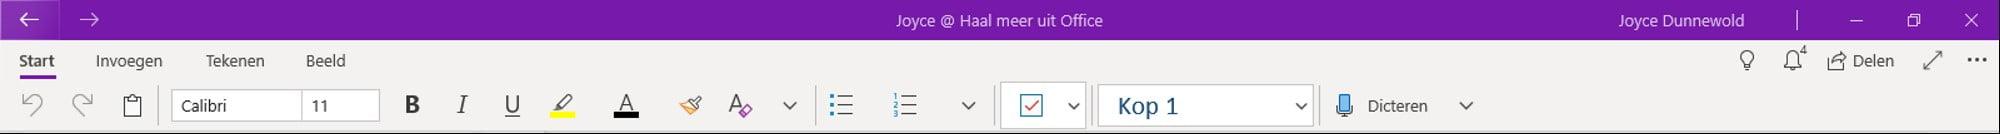 OneNote_versie Windows10_Haal meer uit Office.png